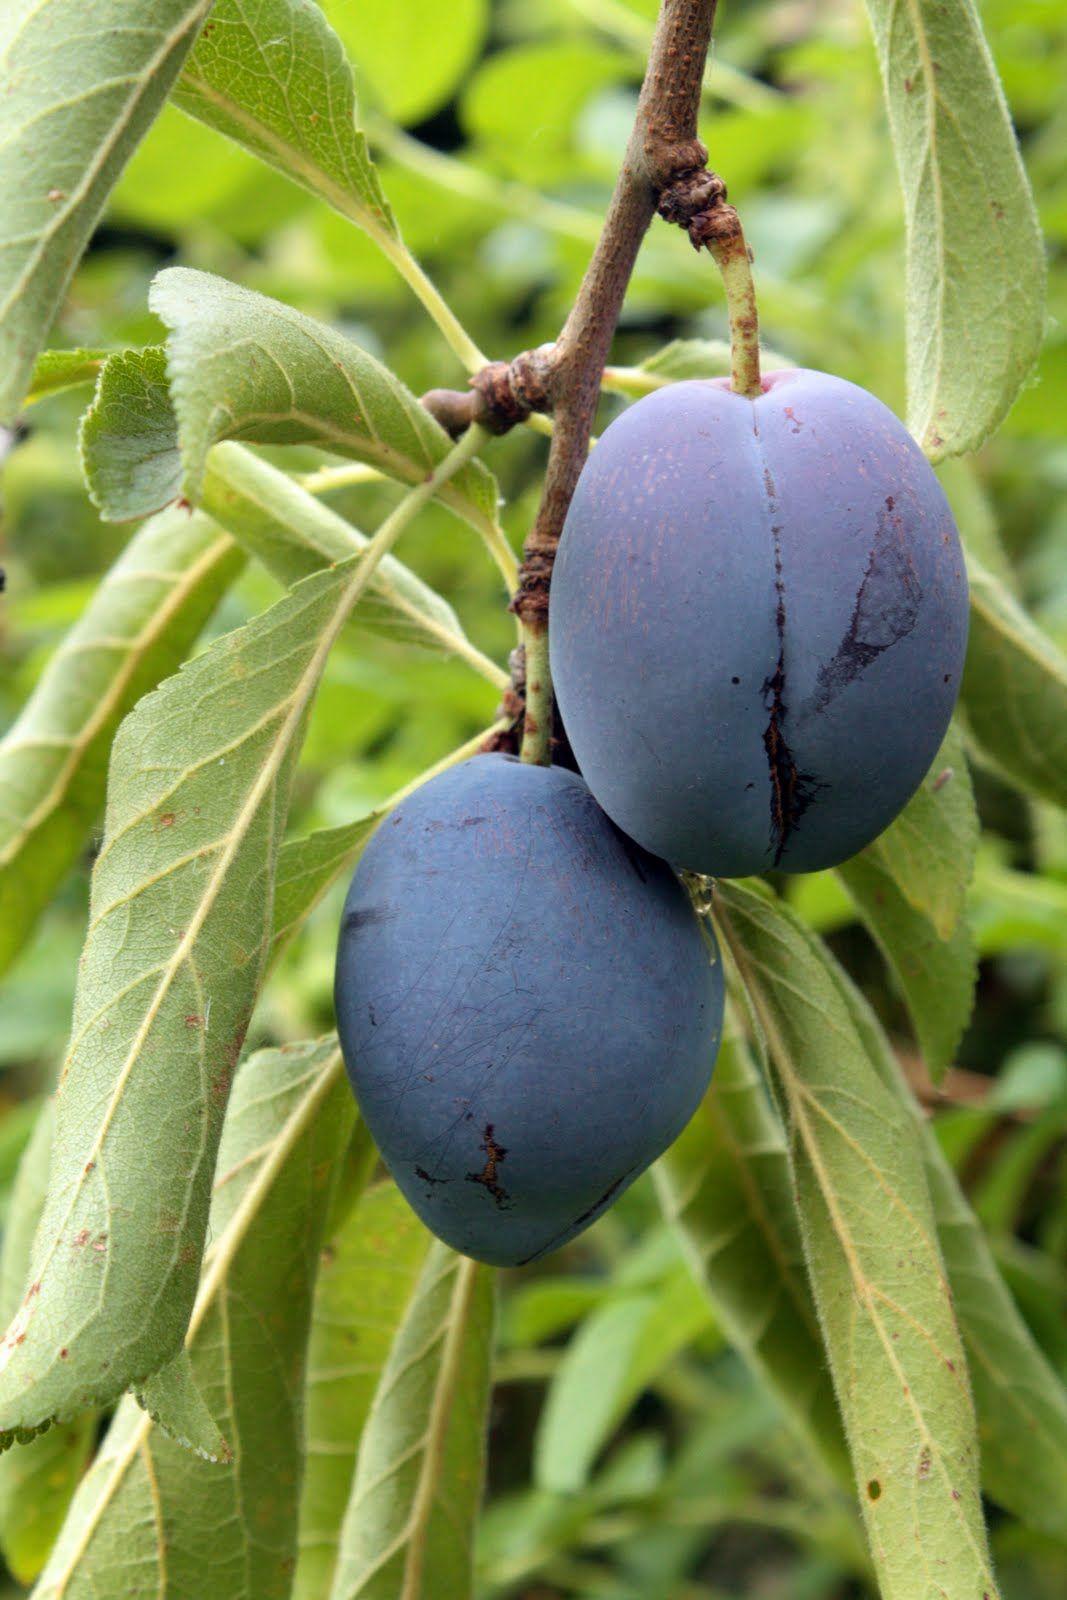 2015 08 decorating with plum and damson - Damson Plum Prunus Institia Has A Small Roundish Blue Black Fruit With